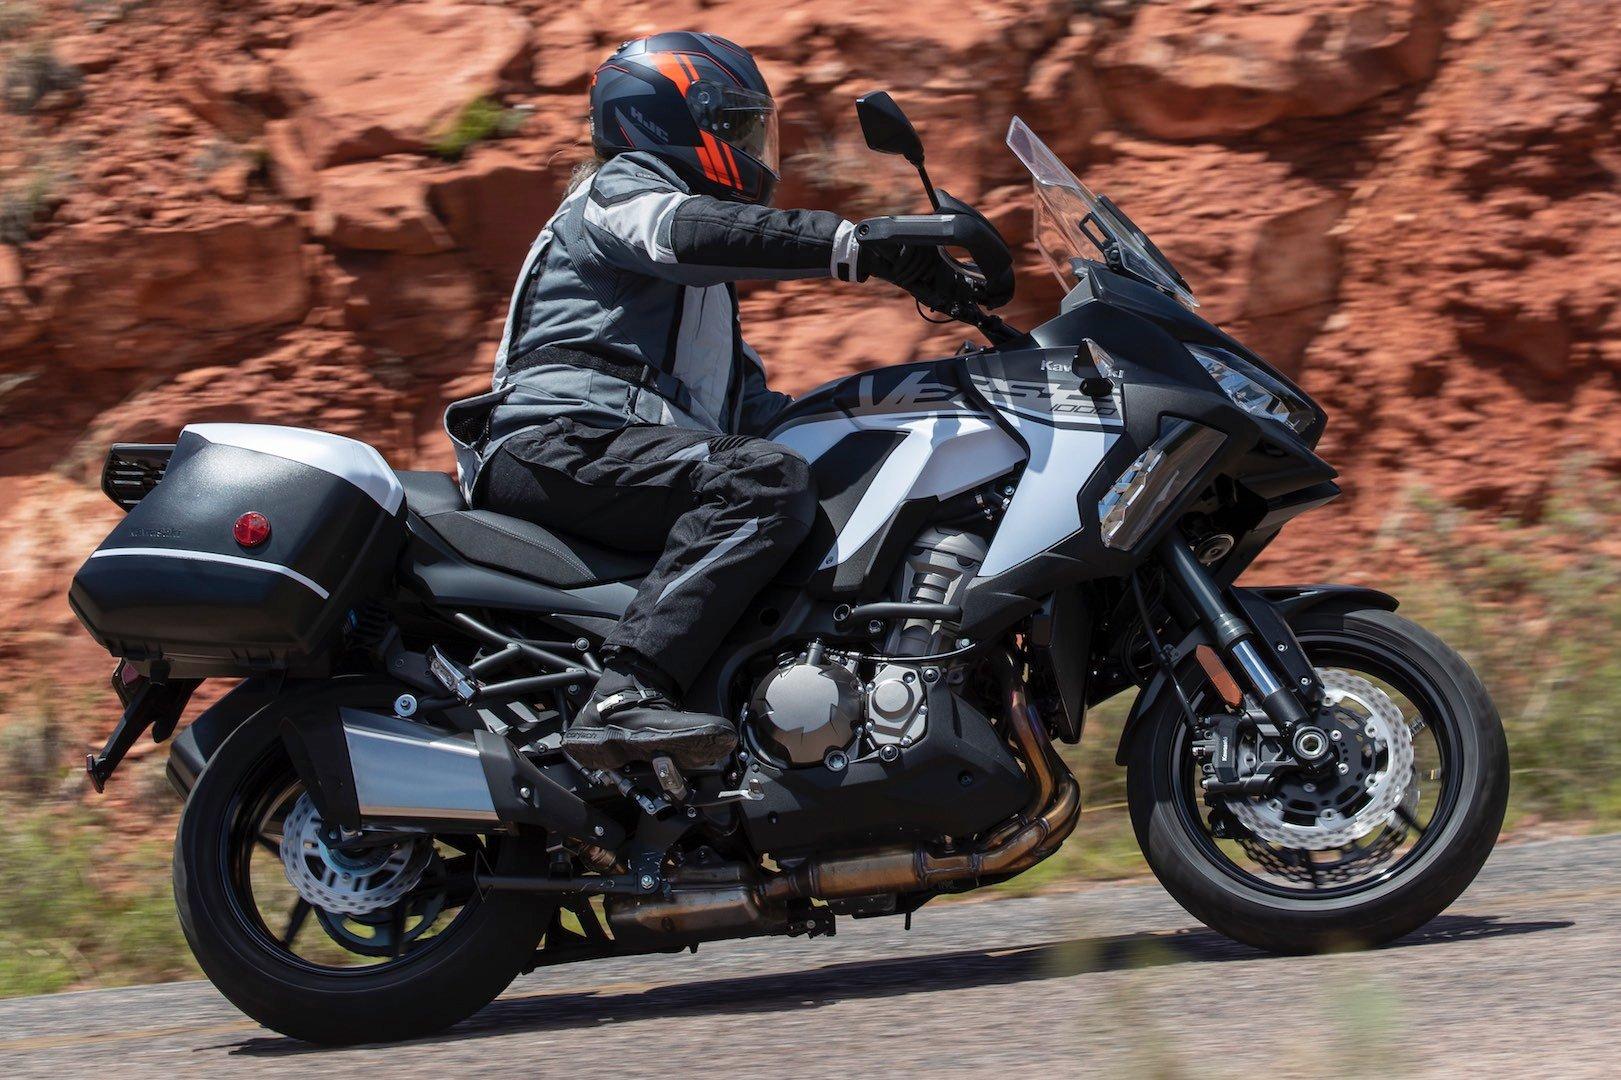 2019 Kawasaki Versys 1000 SE LT+ Review (19 Fast Facts)